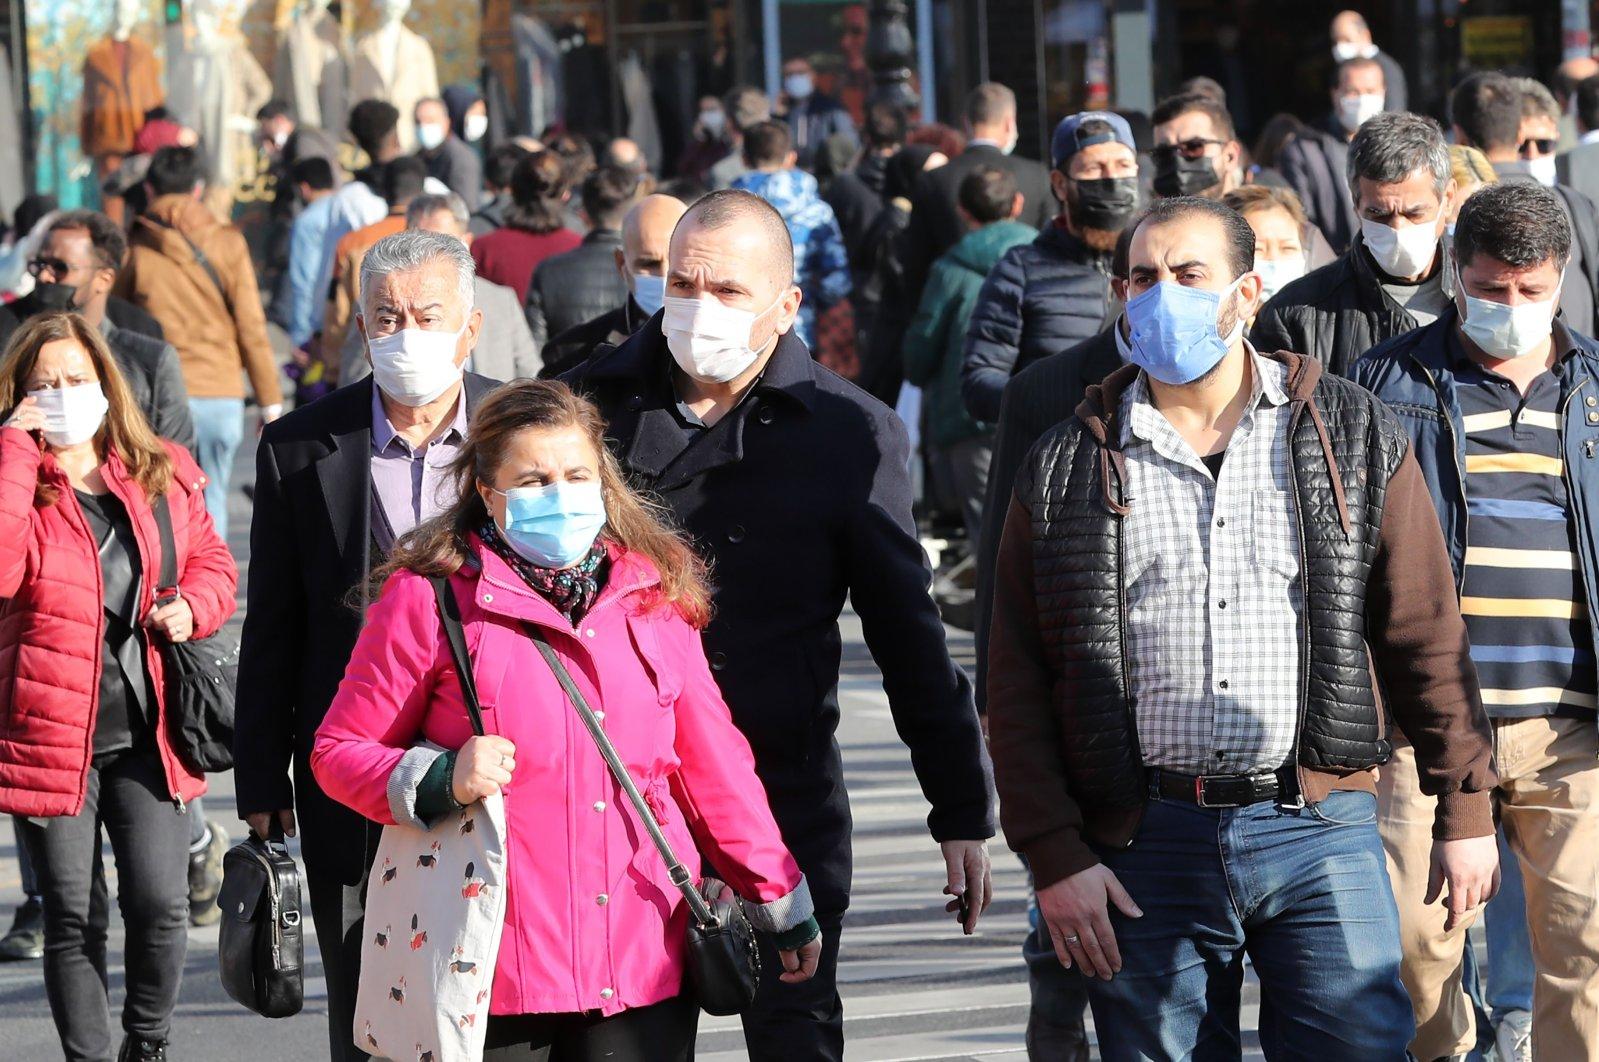 Pedestrians wearing face masks walk in the capital Ankara, Turkey, Nov. 13, 2020. (AFP Photo)